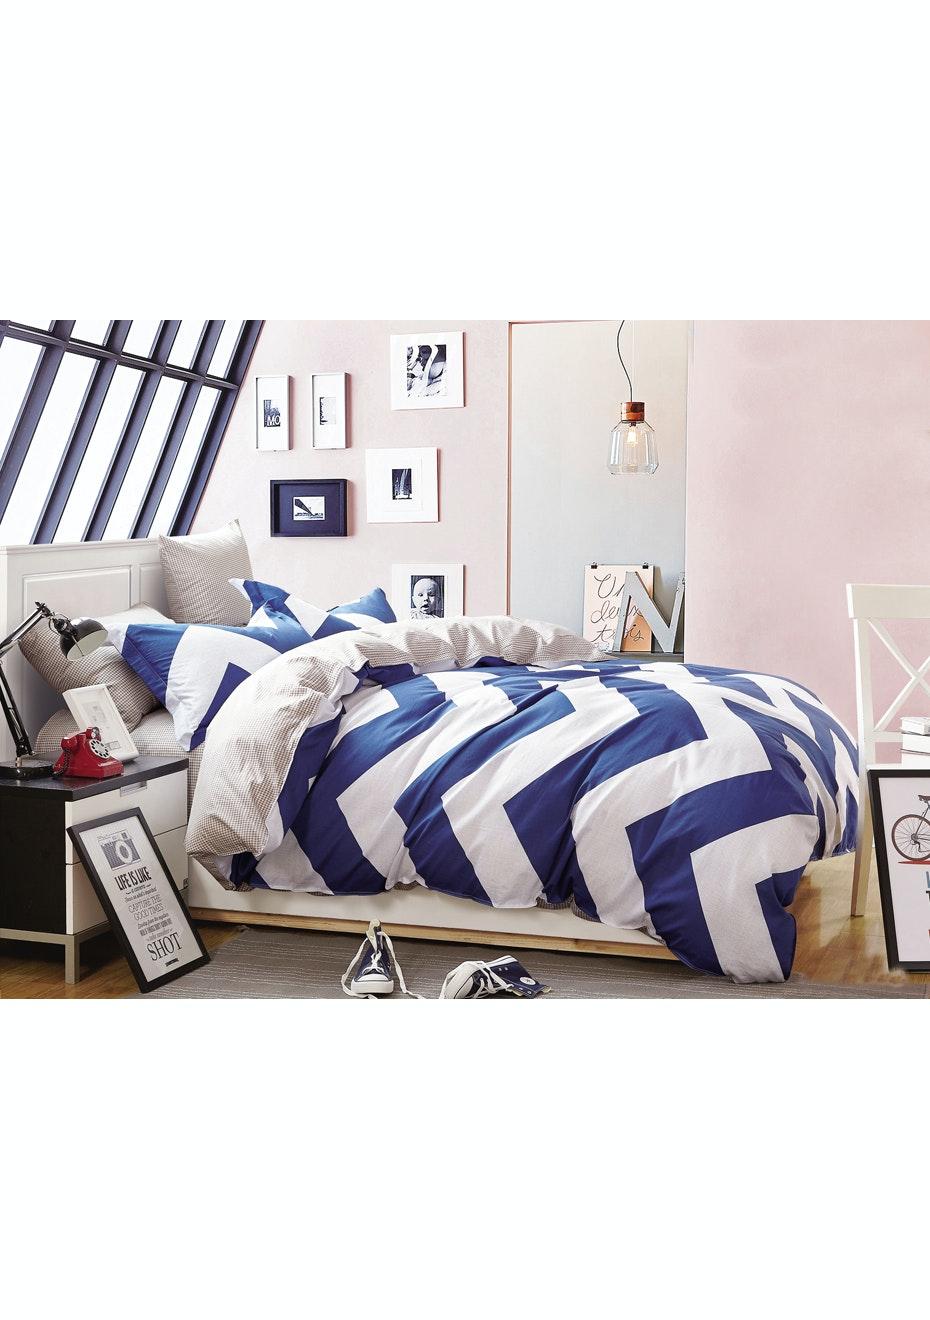 San Diego Quilt Cover Set - Reversible Design - 100% Cotton King Bed